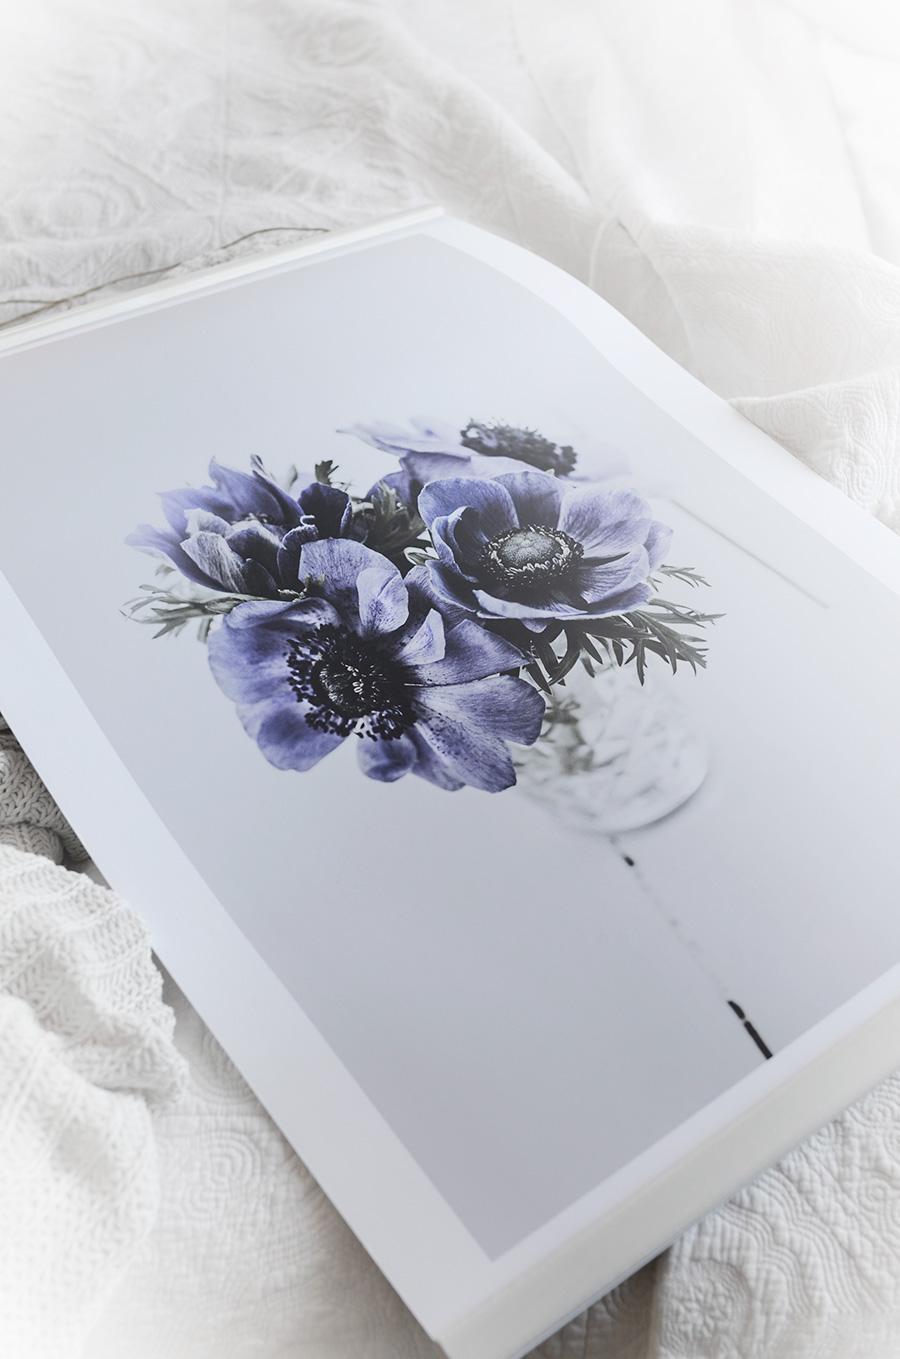 anemon, anemoner, sovrum, inredning, poster, tavla, konst, fotokonst, printler, atelje livsglitter, konstnär dalarna, louise hietanen, fotograf